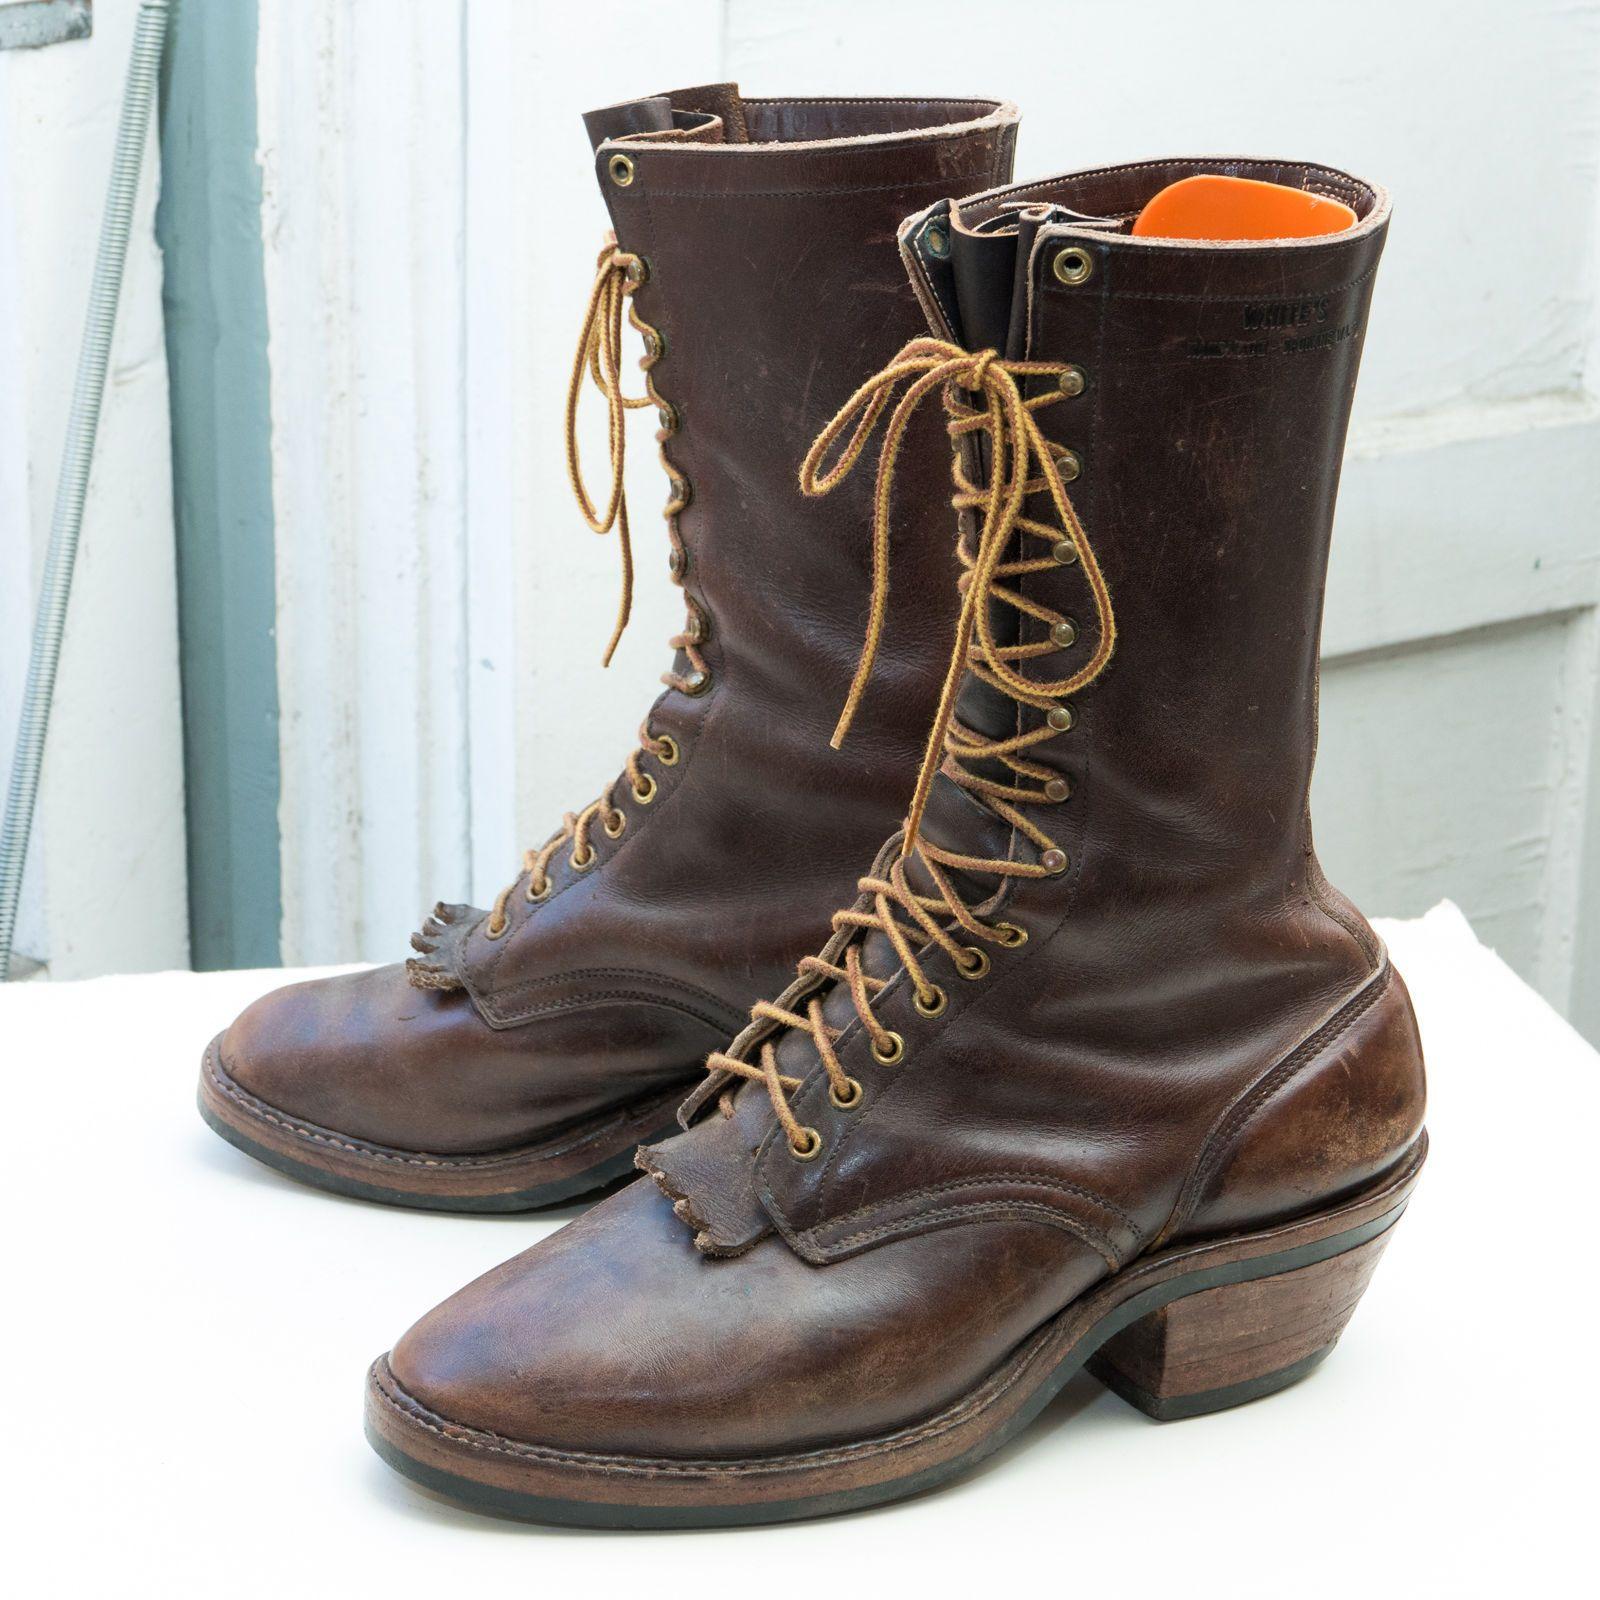 WHITE'S Custom Packer Boot, sz 10.5 FF (EEEE)- Brown Leather ...